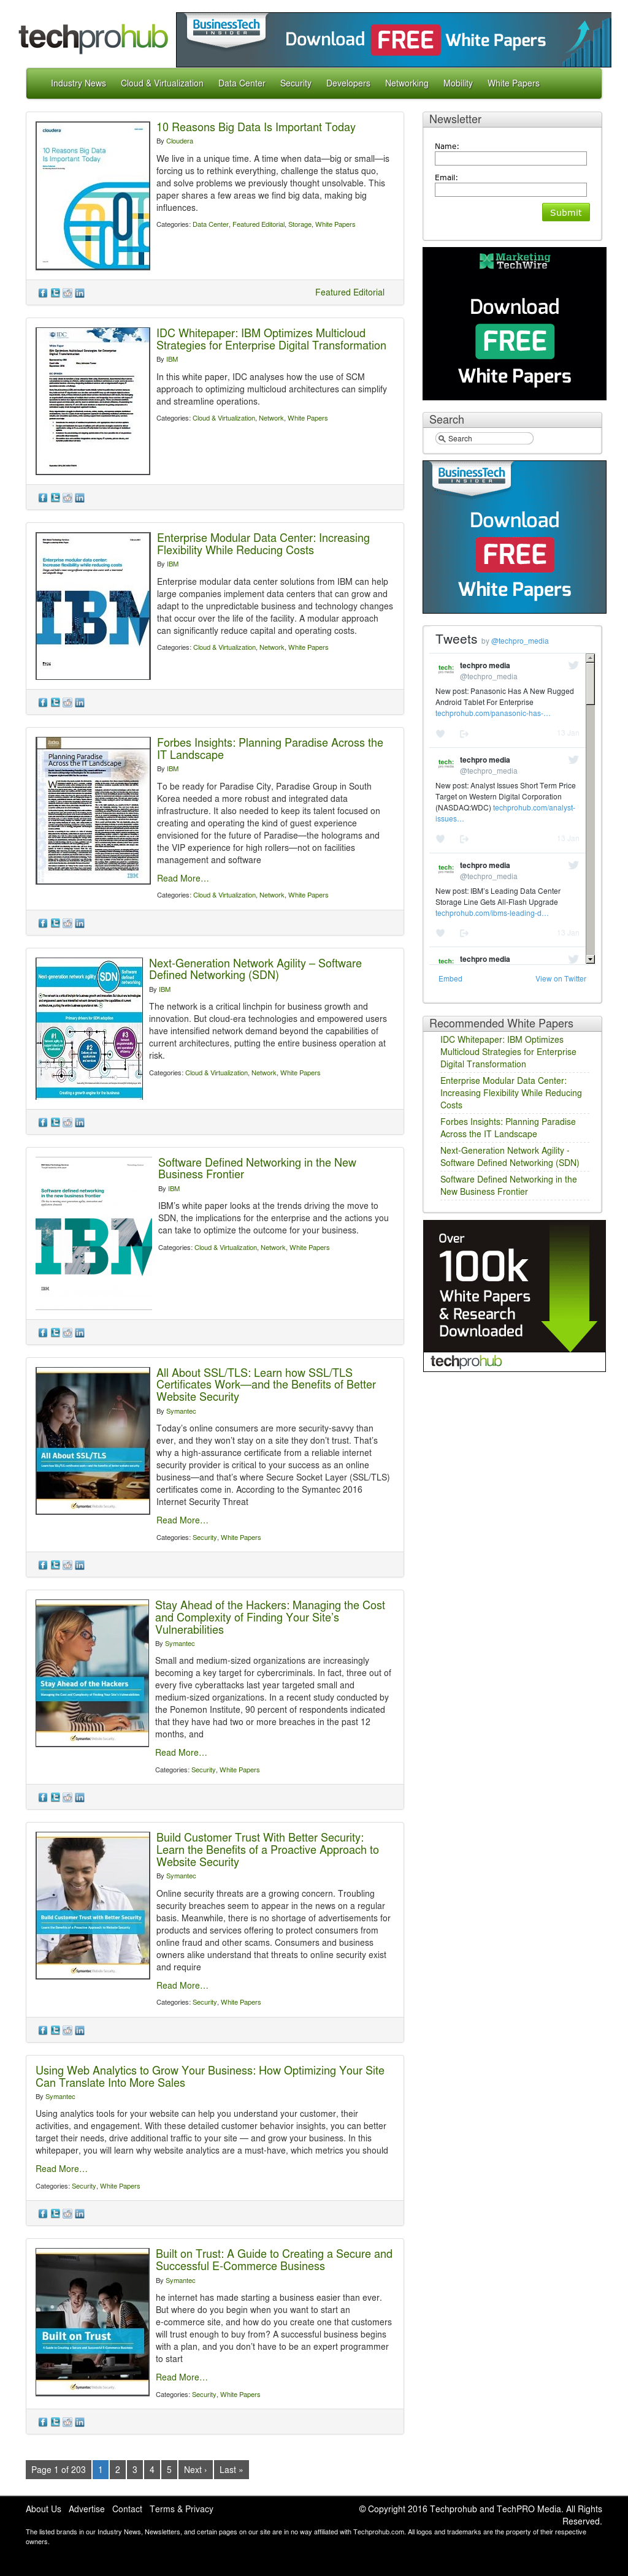 Techprohub And Techpro Media Competitors, Revenue and